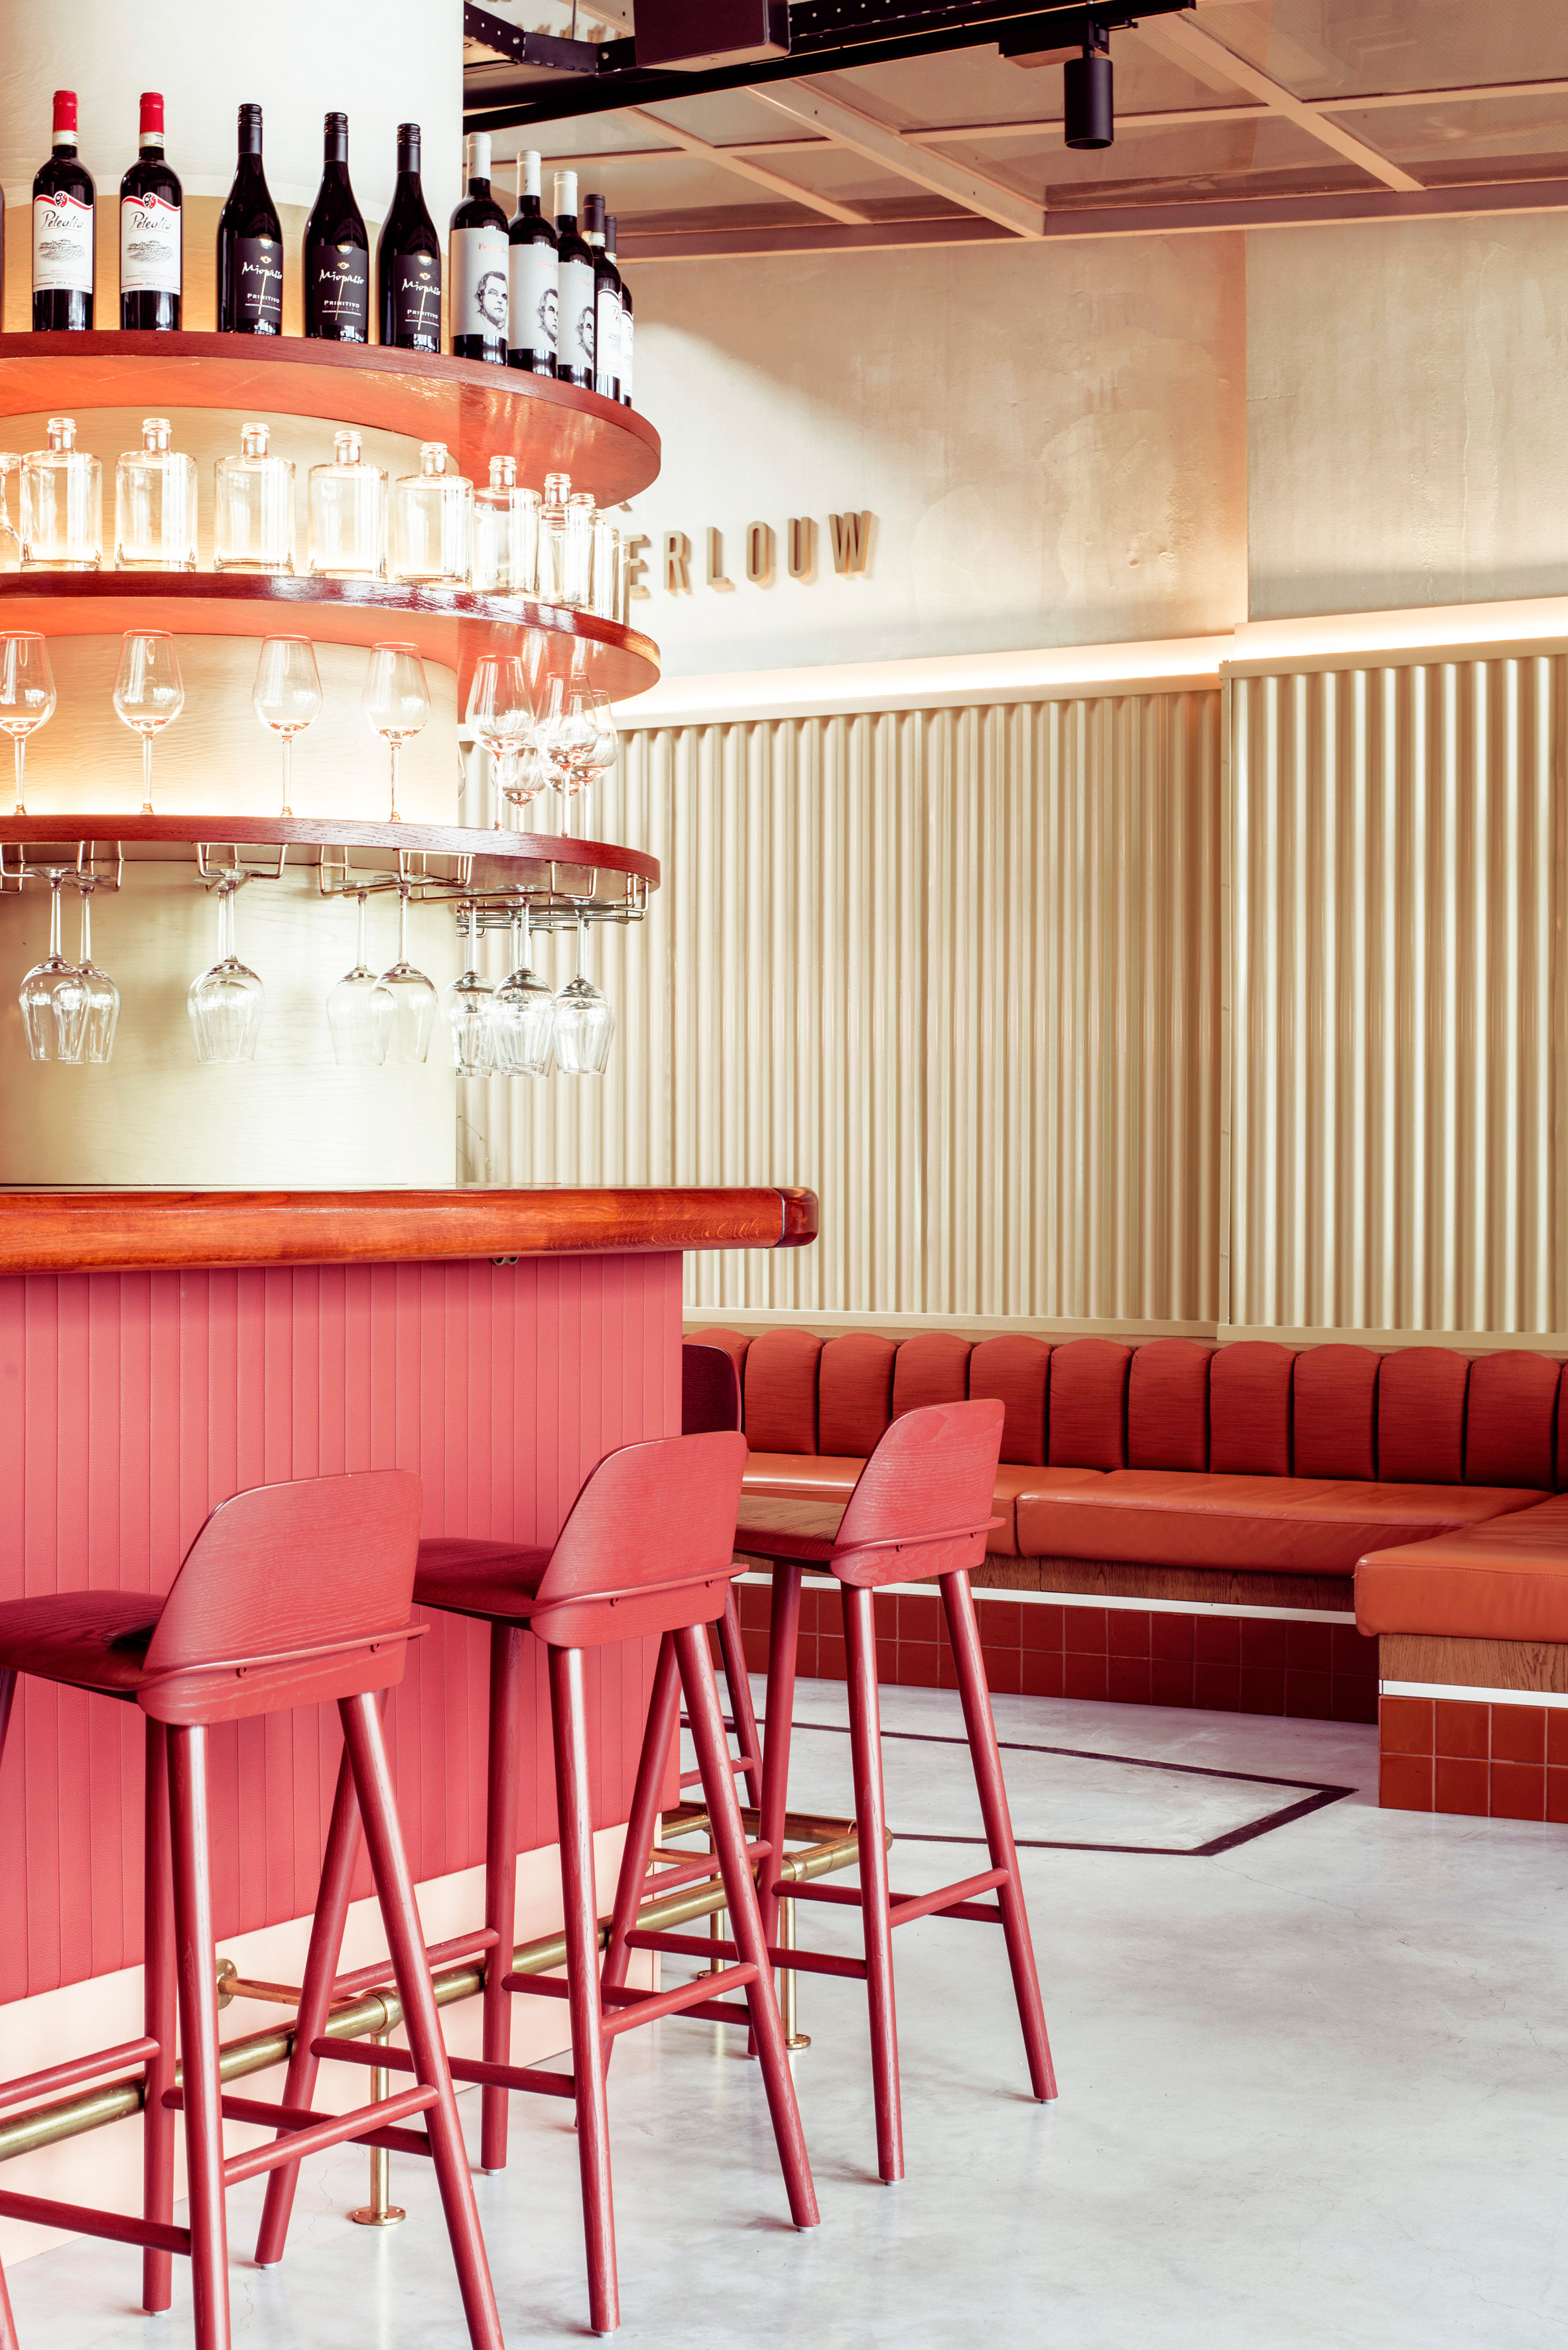 Interiors of Garage Pompen & Verlouw restaurant by Studio 34 South